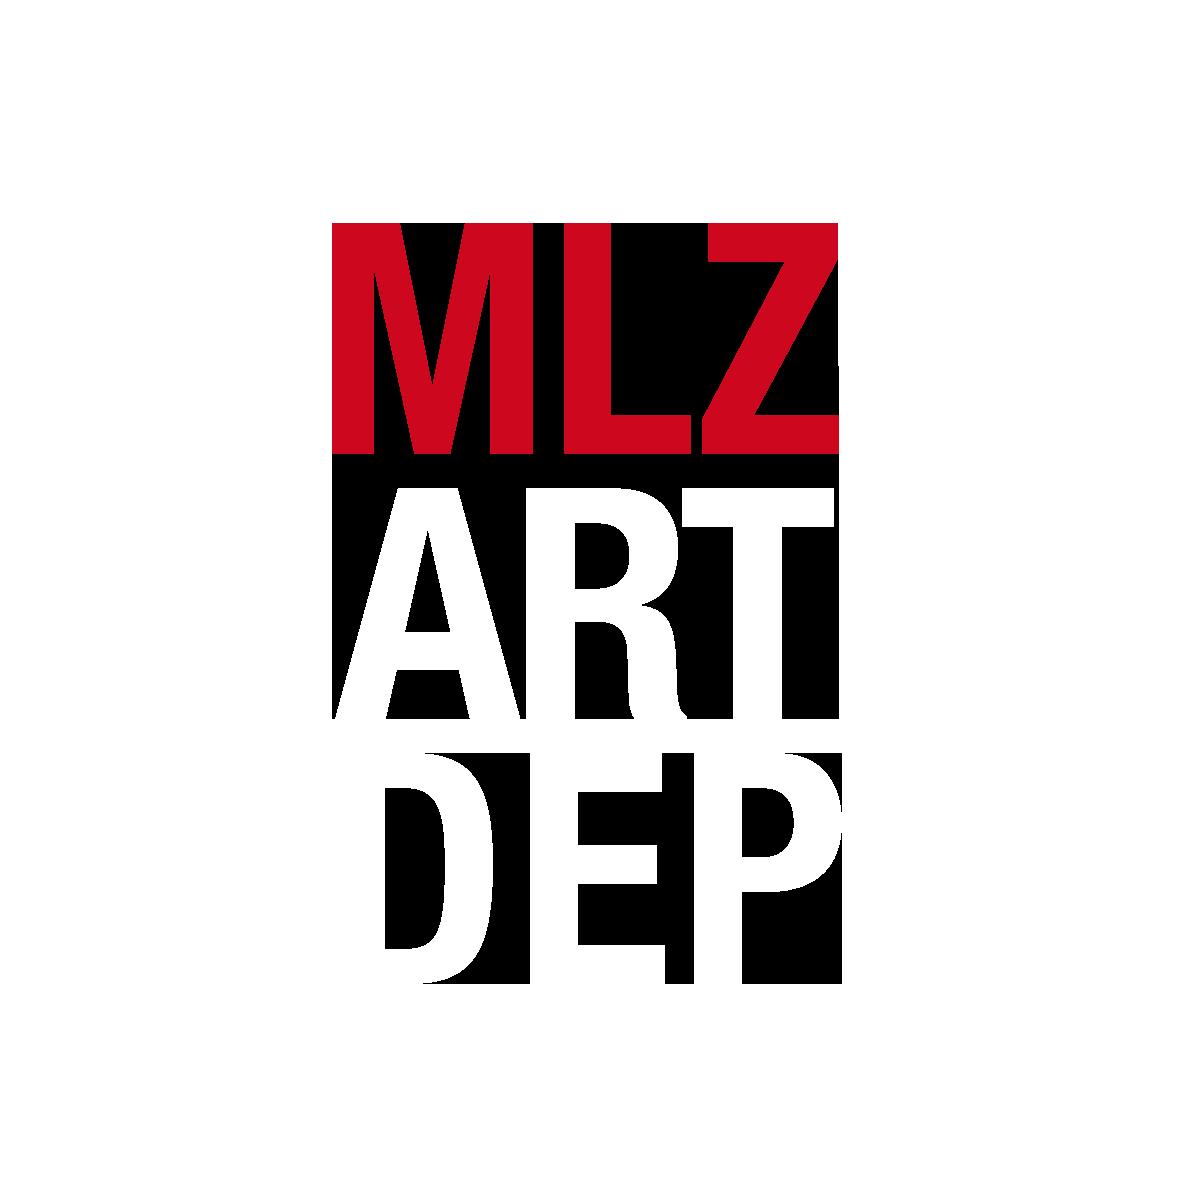 mlz art dep galleria arte contemporanea trieste italy